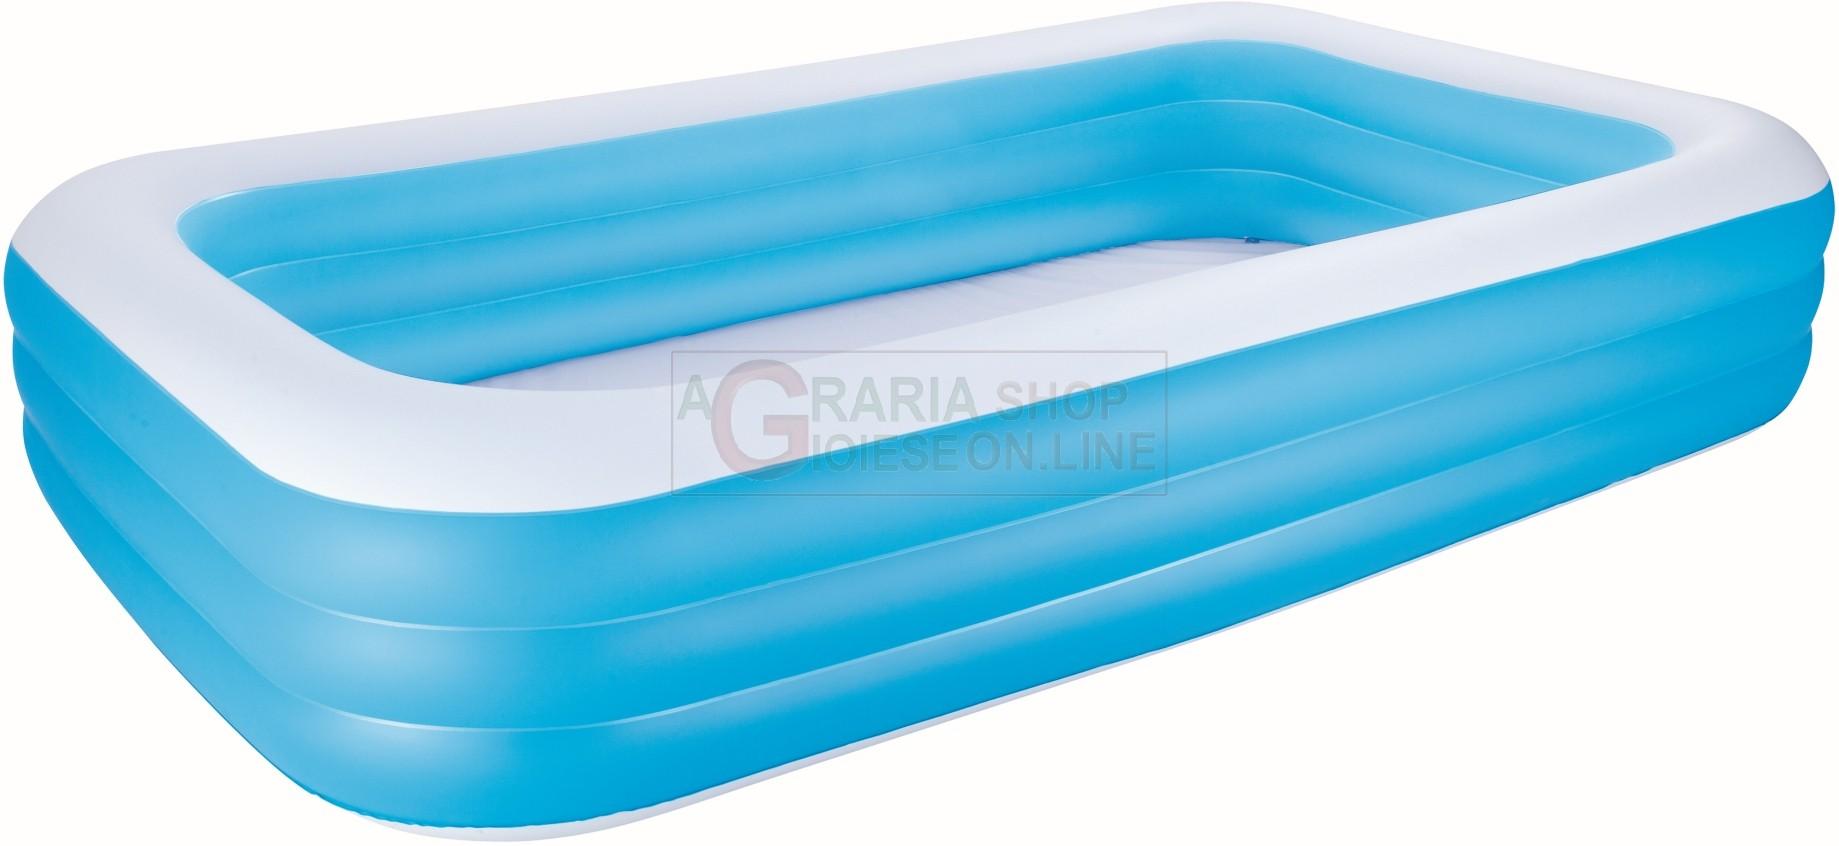 Bestway 54009 piscina gonfiabile rettangolare cm 305x183x56h - Manutenzione piscina fuori terra bestway ...